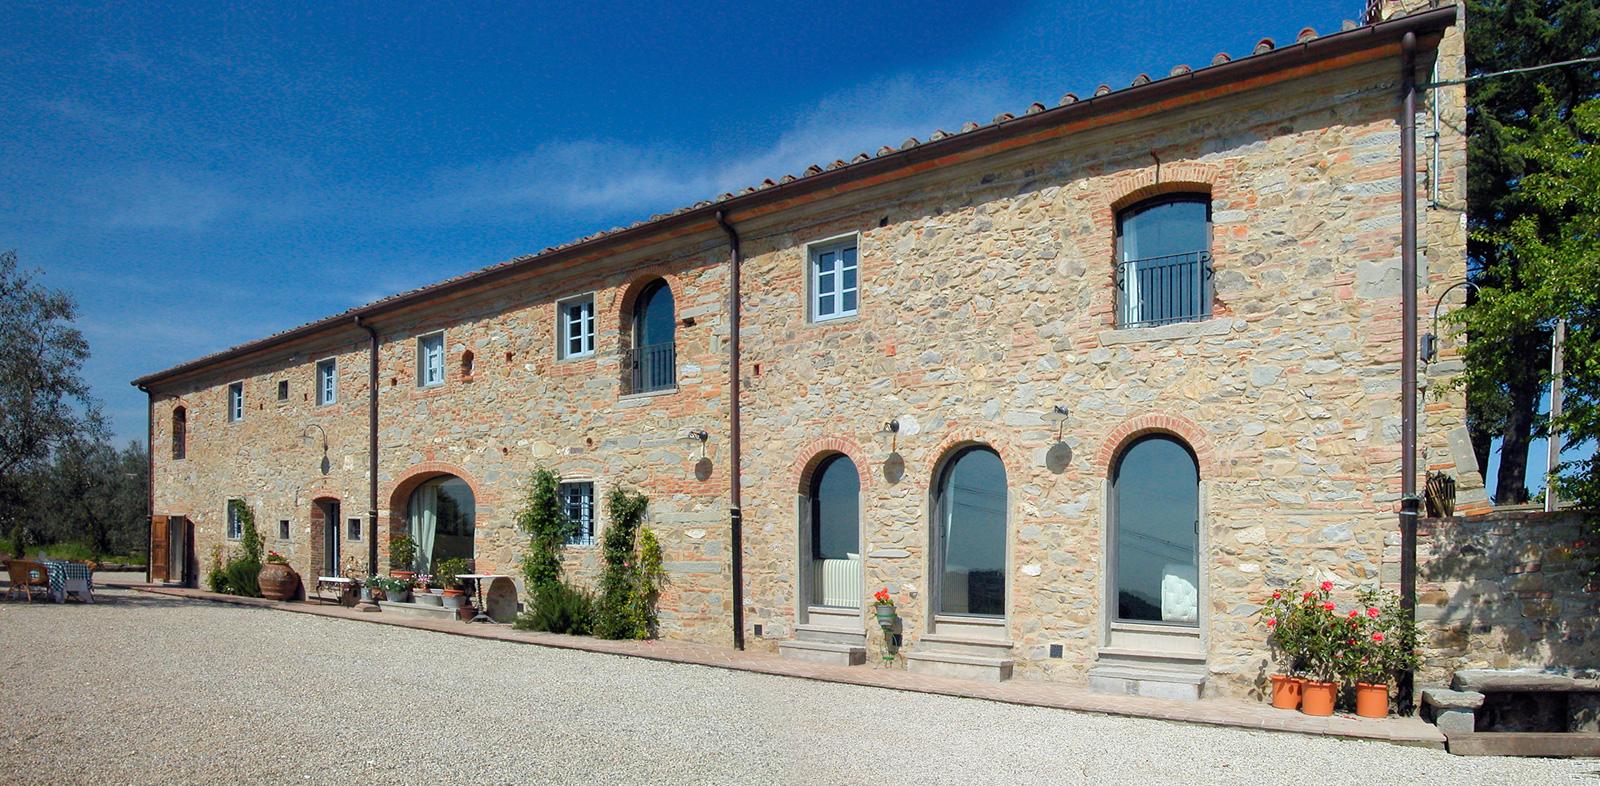 Matrimonio D Inverno Location Toscana : Fattoria la serra location location matrimoni firenze